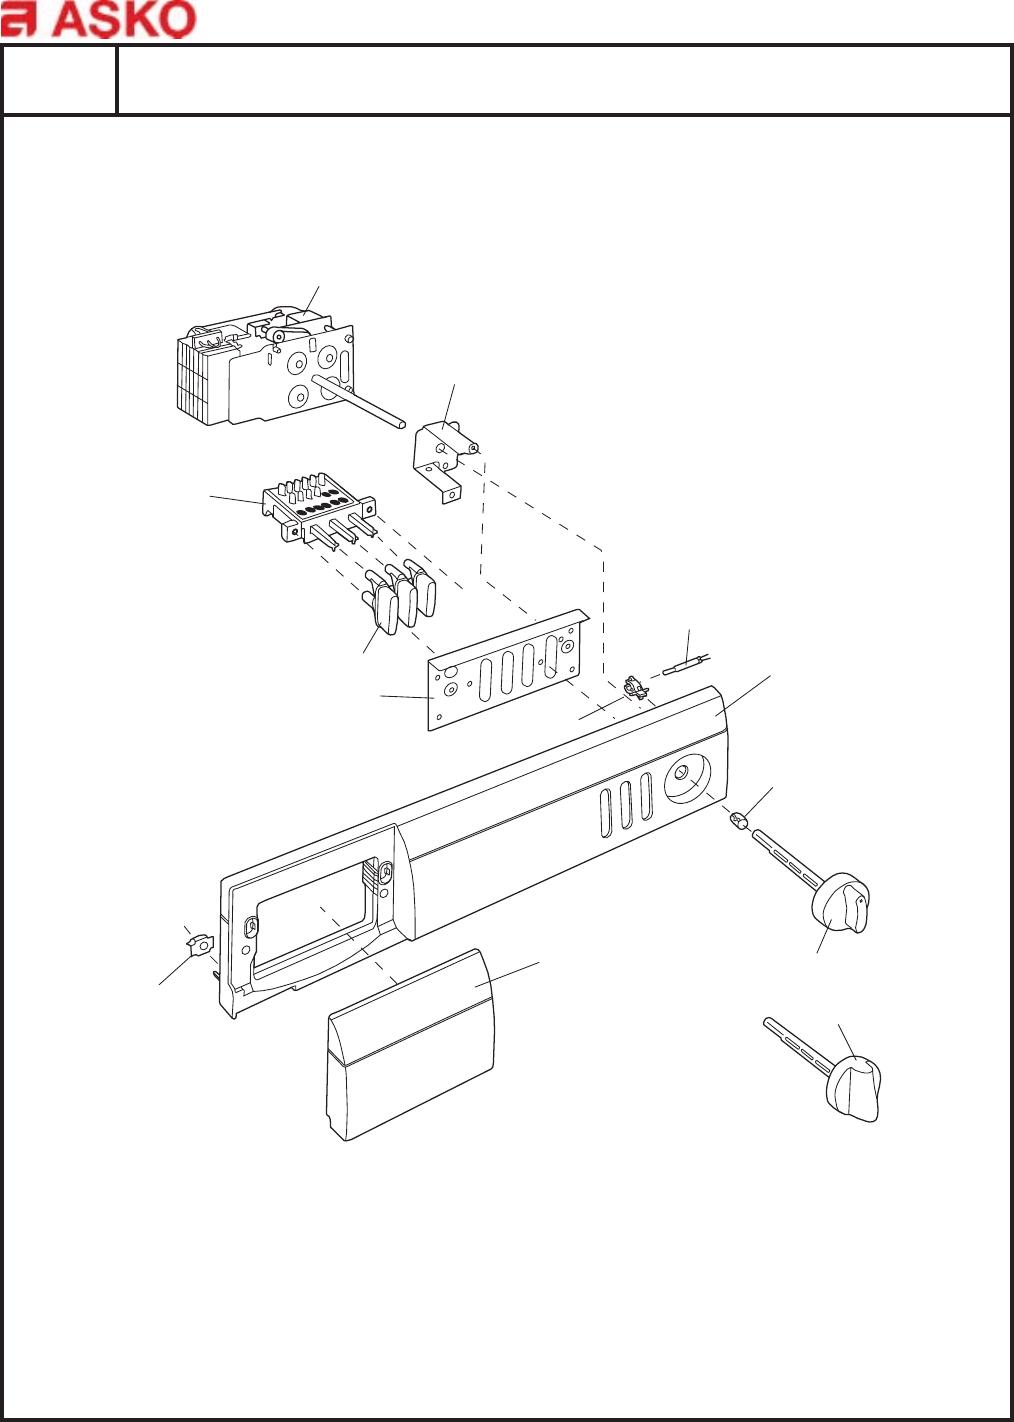 Asko Dryer TD70A 7005 US WHITE